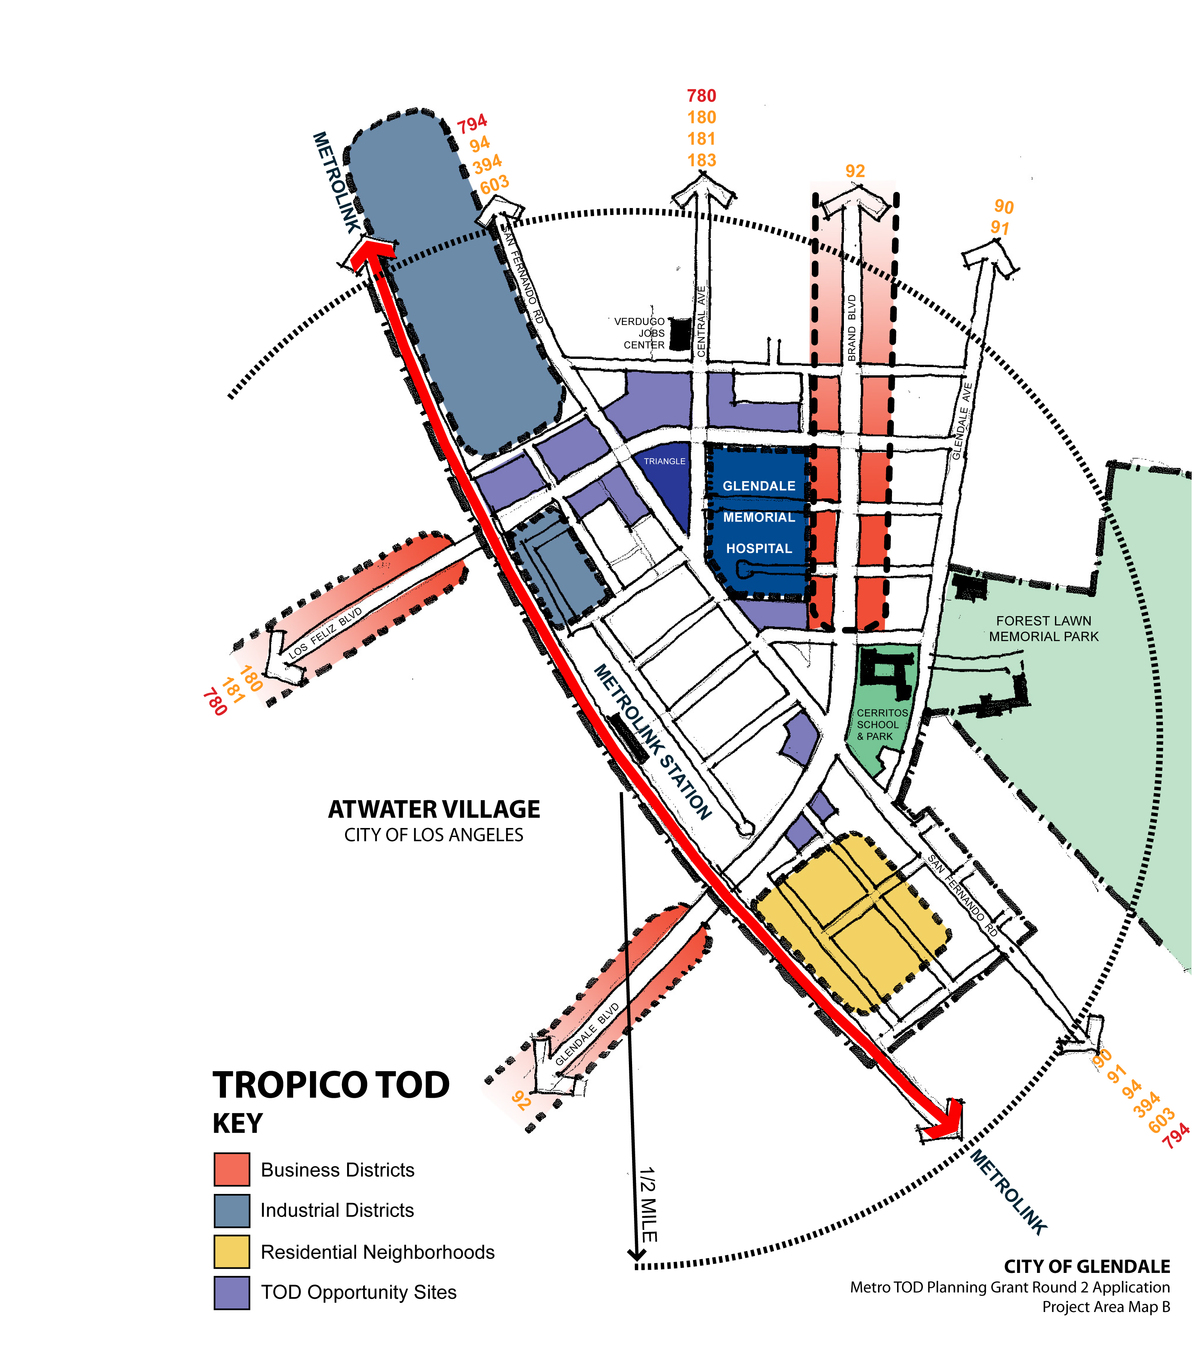 Tropico Station Study Area